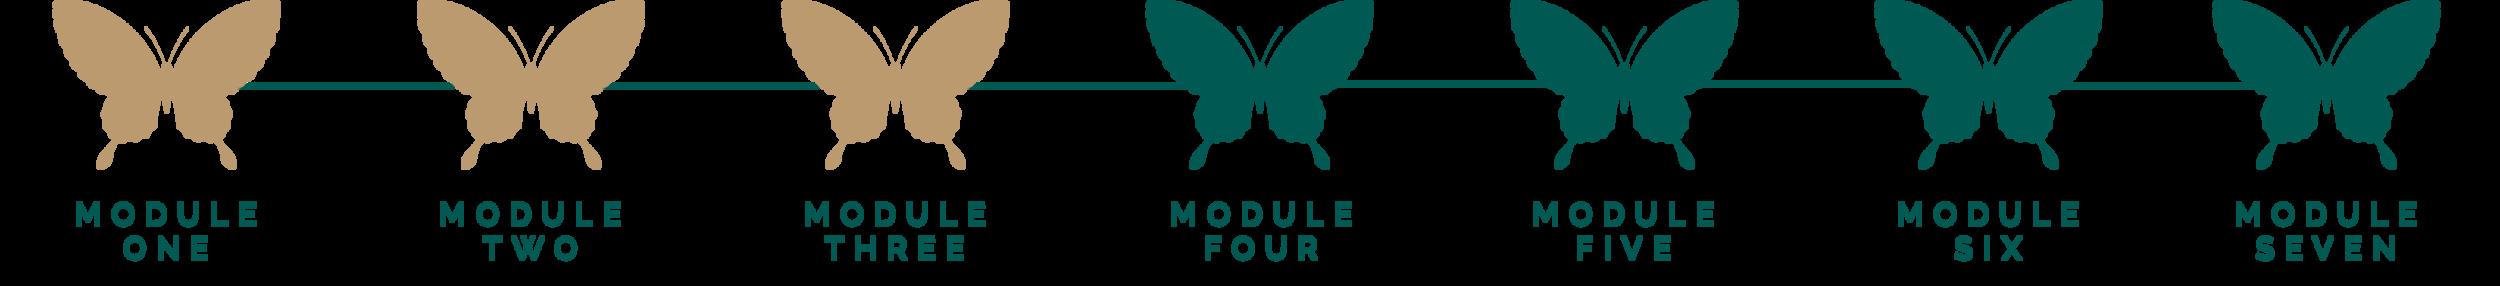 Module 3.7.png